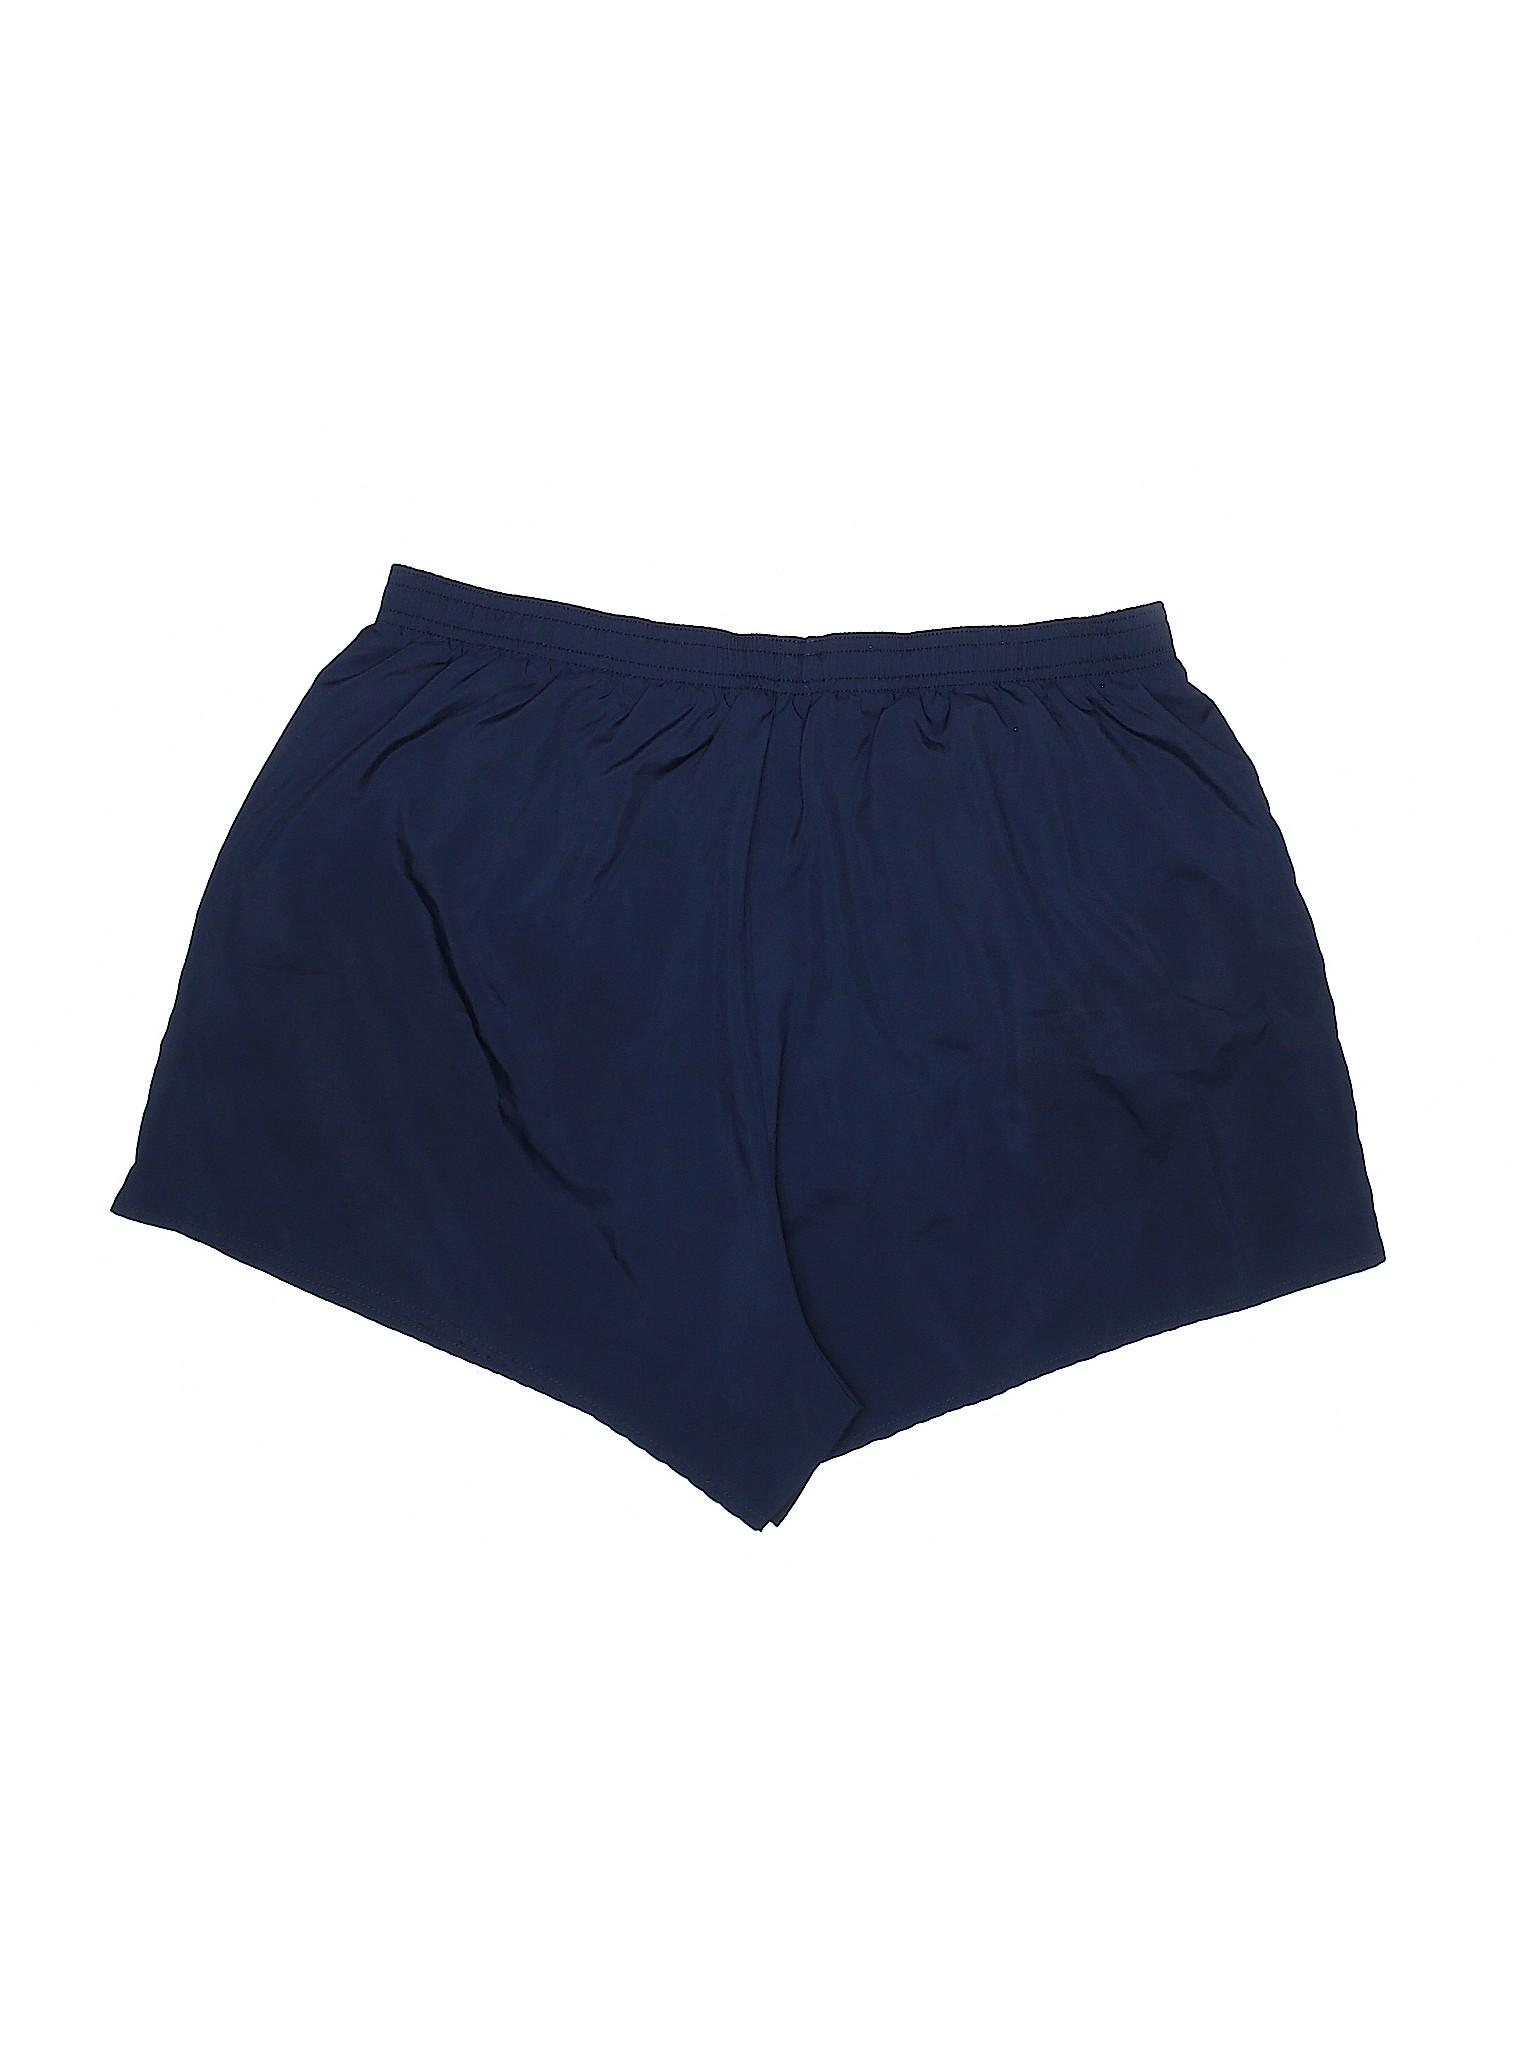 Lady Athletic Locker Shorts Foot Boutique 0qTpdtdw